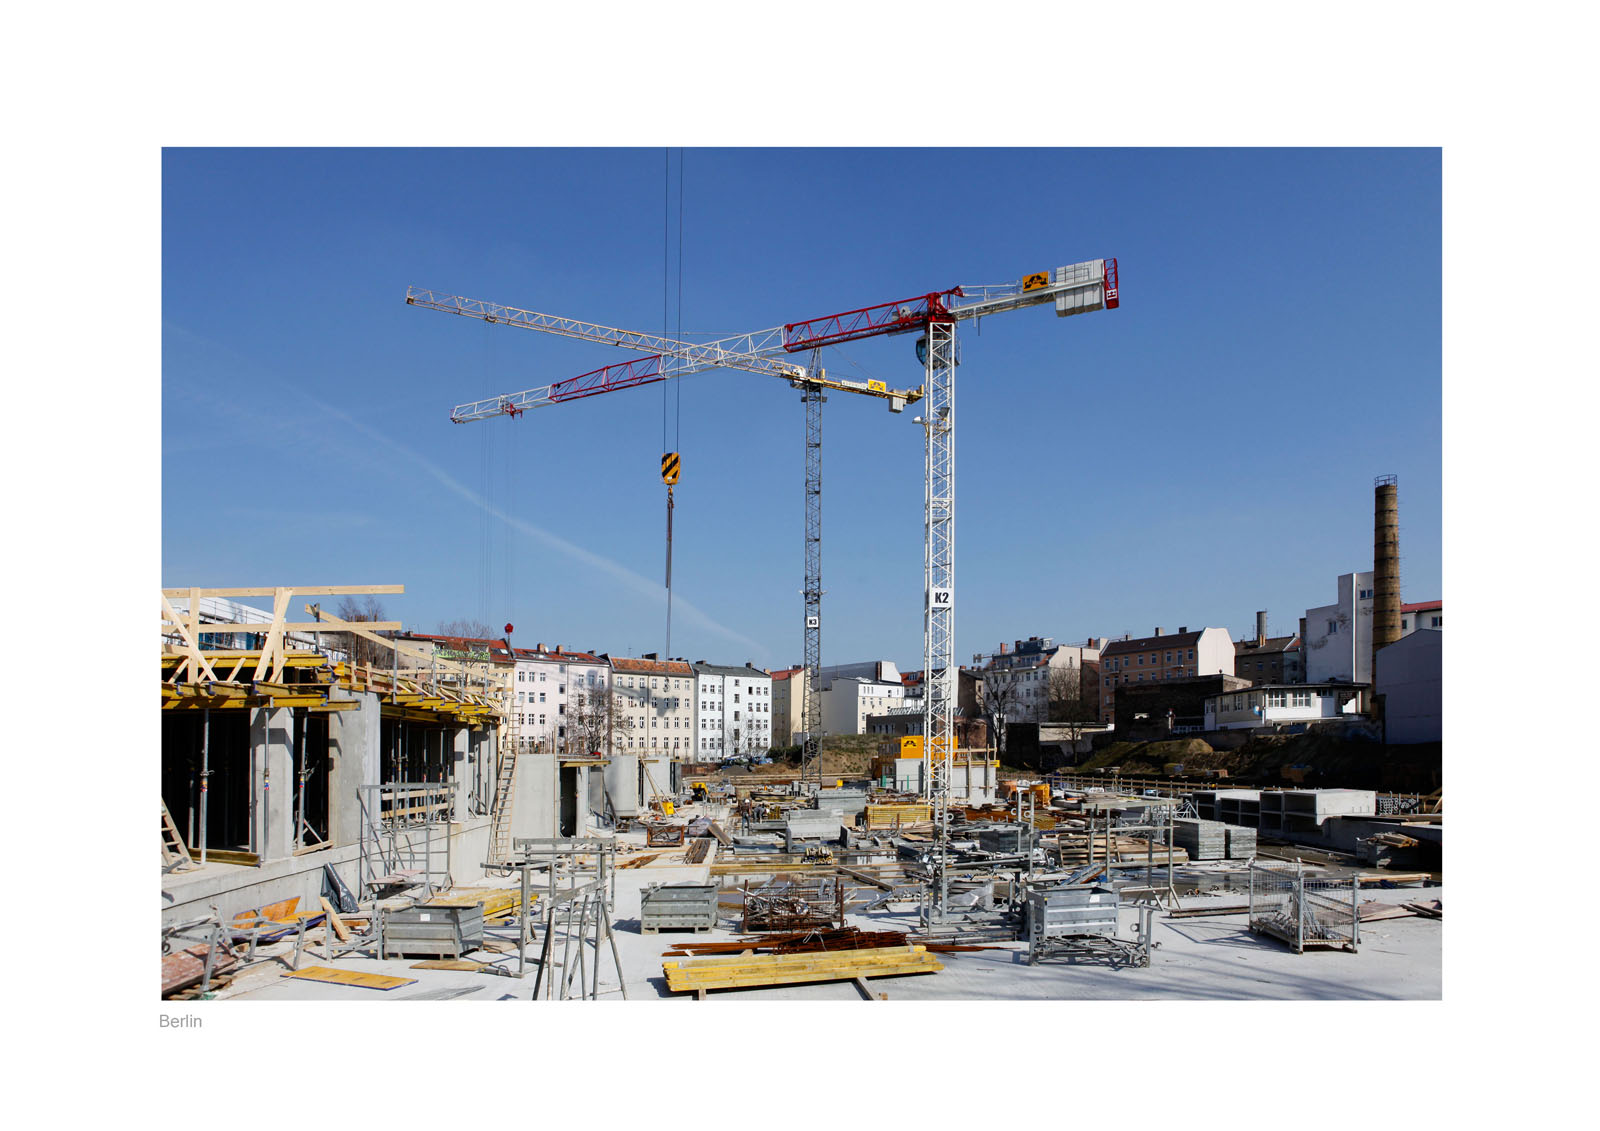 005-Norsic-urbanisme-004